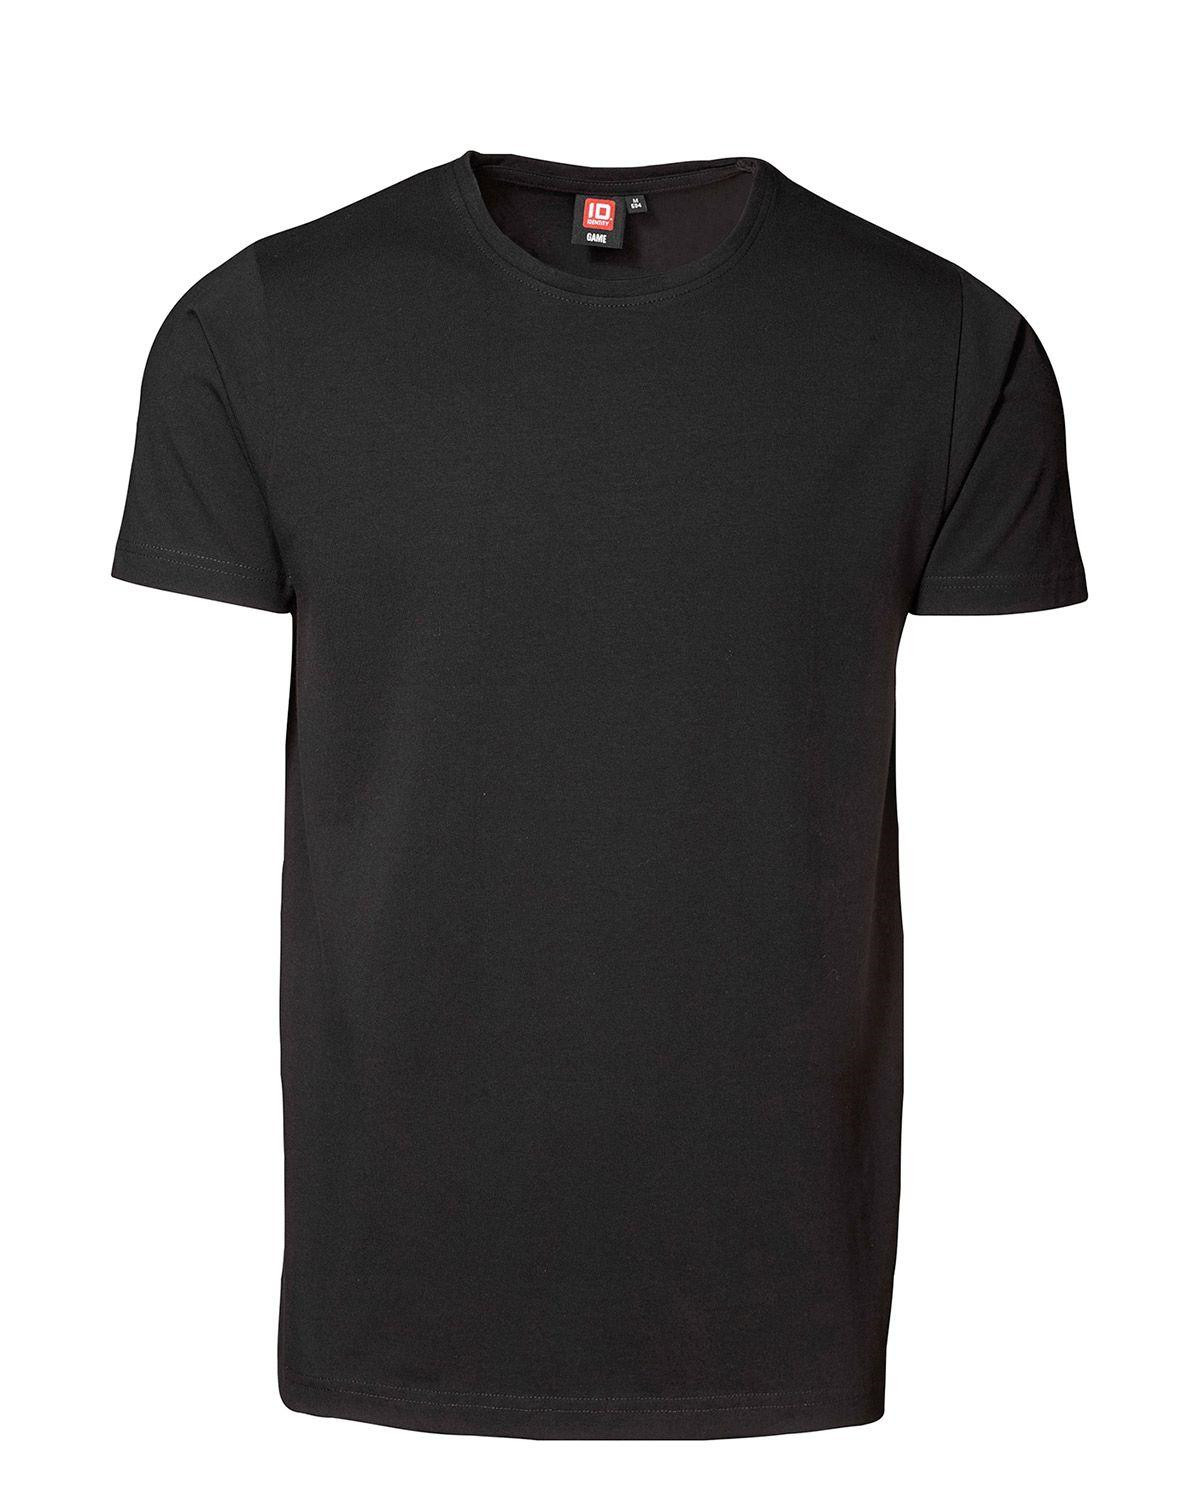 ID Stretch T-shirt (Sort, XL)